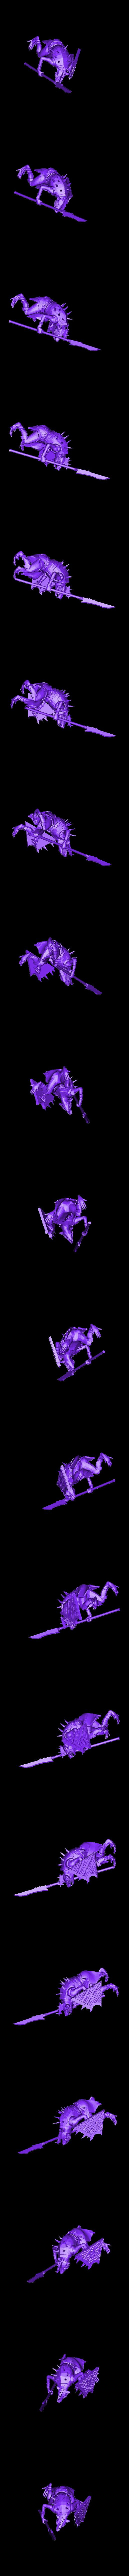 Clanrat_Spear_18.stl Download free 3MF file Gangsta Rats • 3D printer template, EmanG